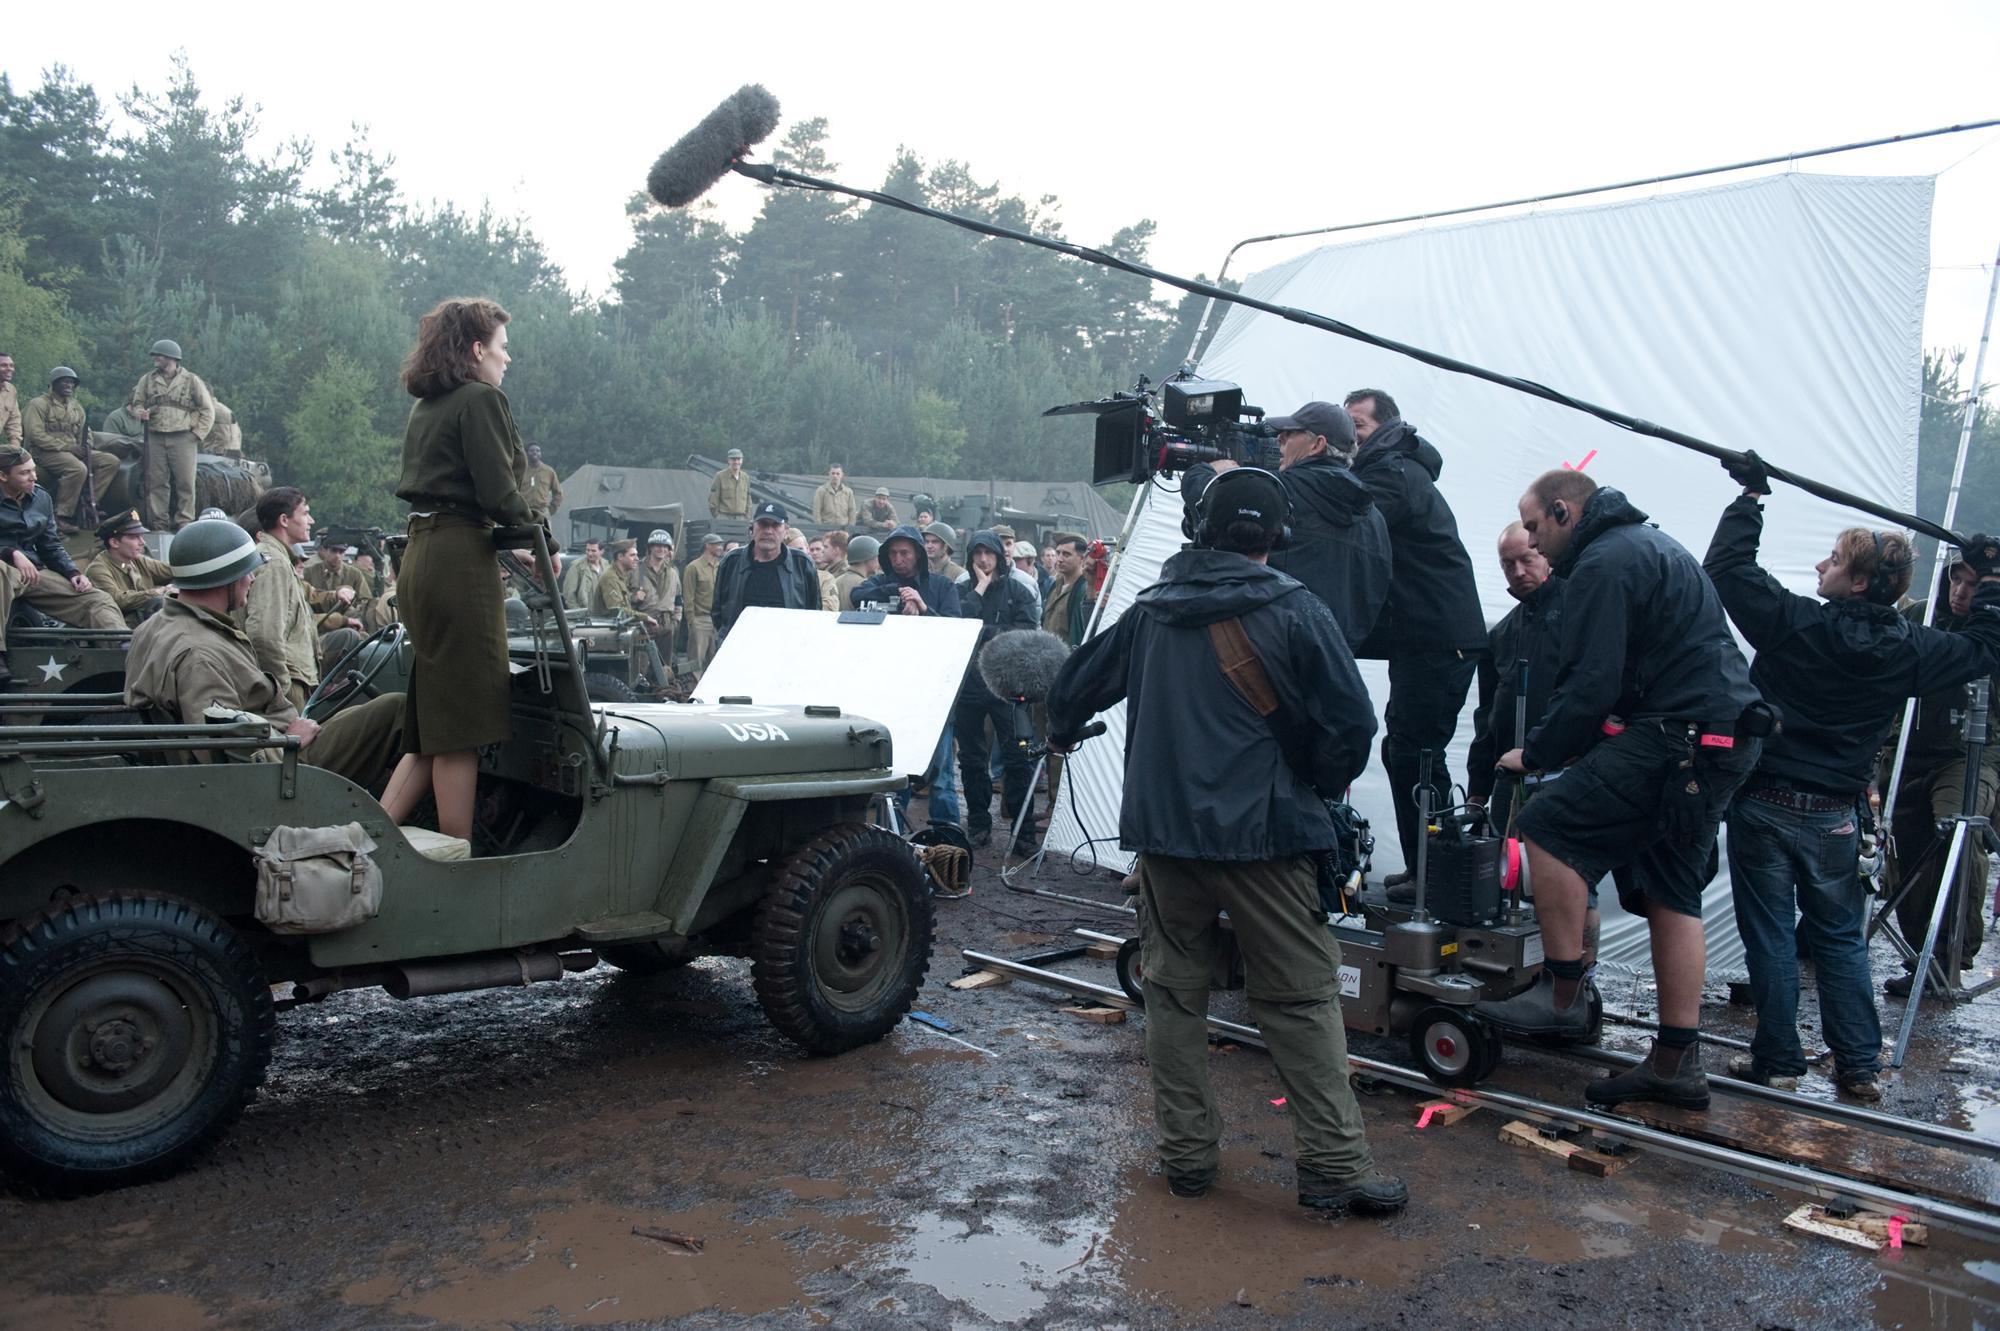 Captain America Set Photo - Bourne Wood - HeyUGuys